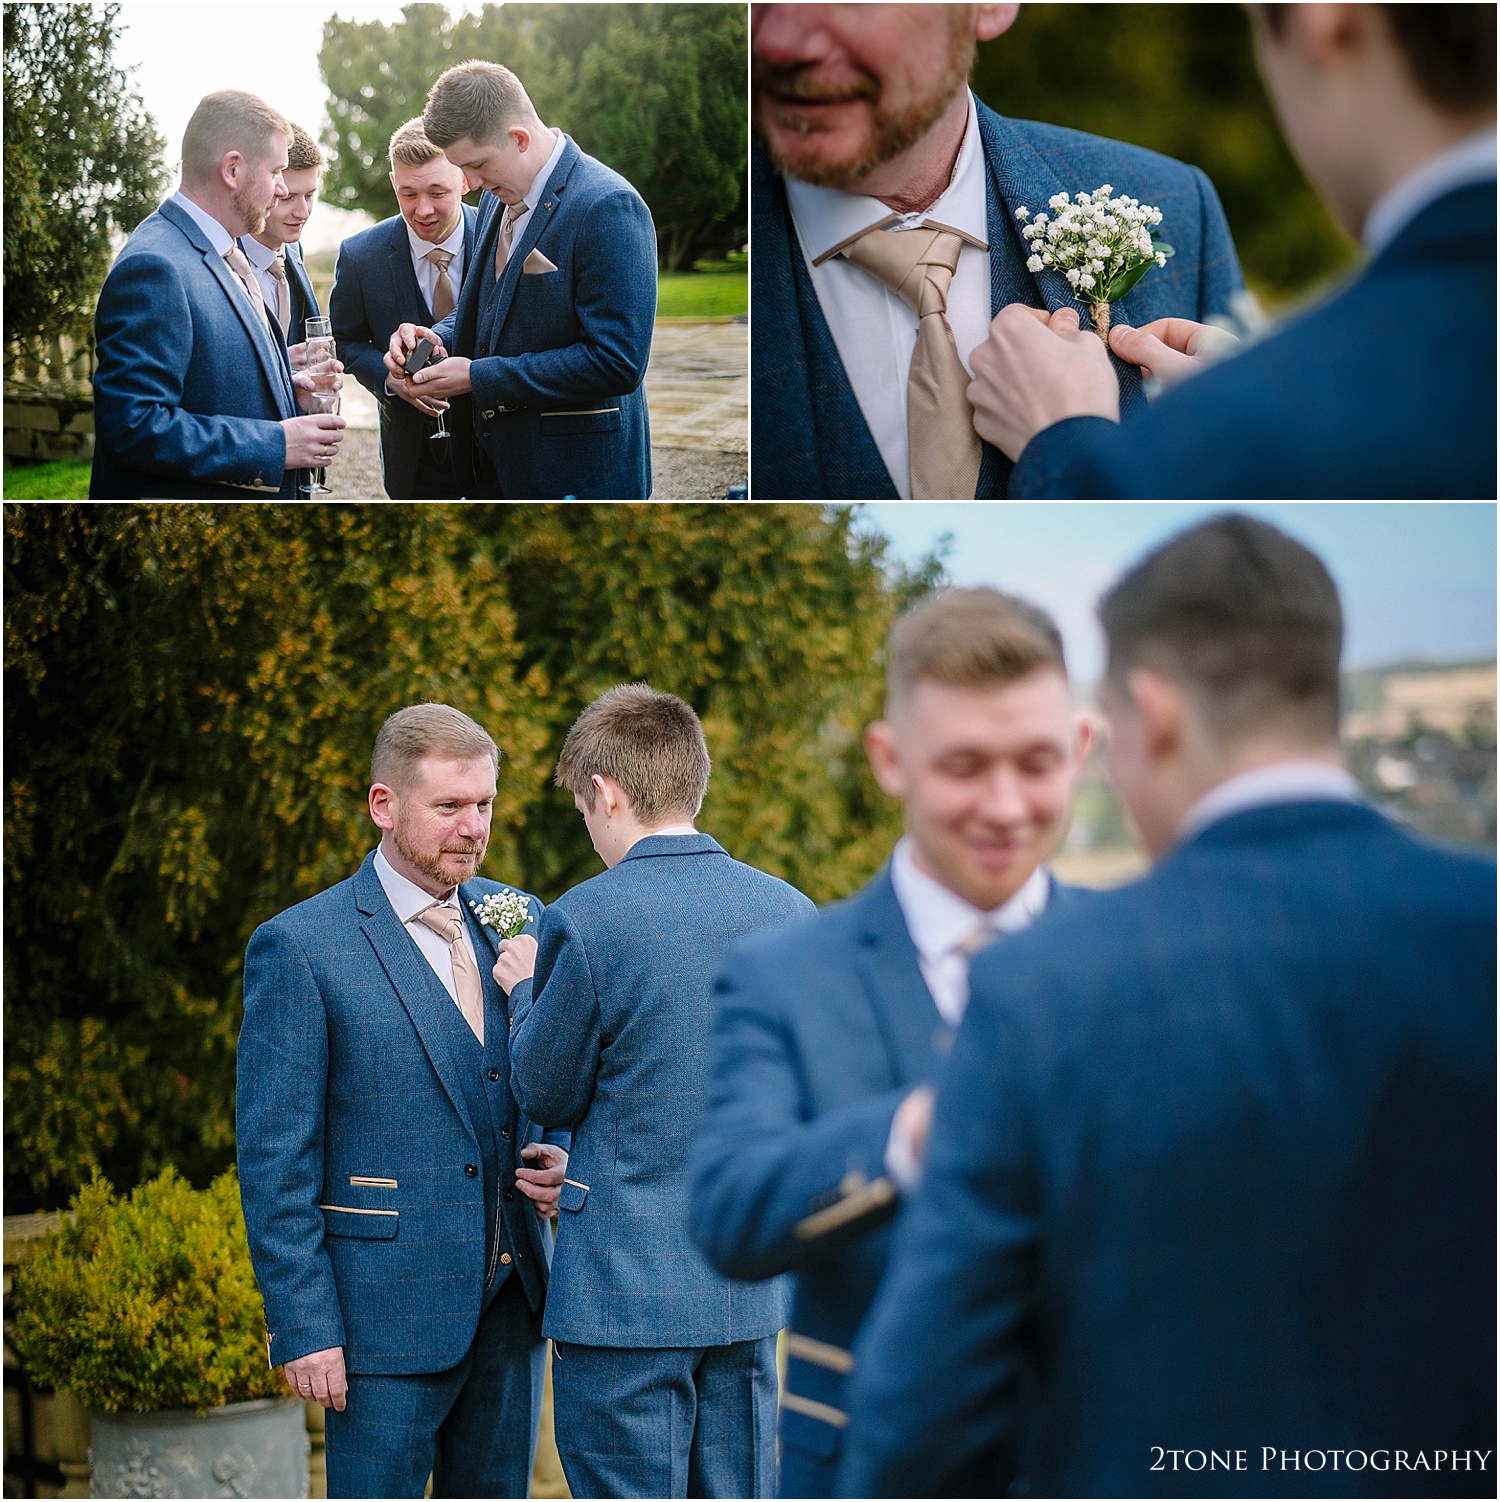 Woodhill Hall wedding photographer 15.jpg